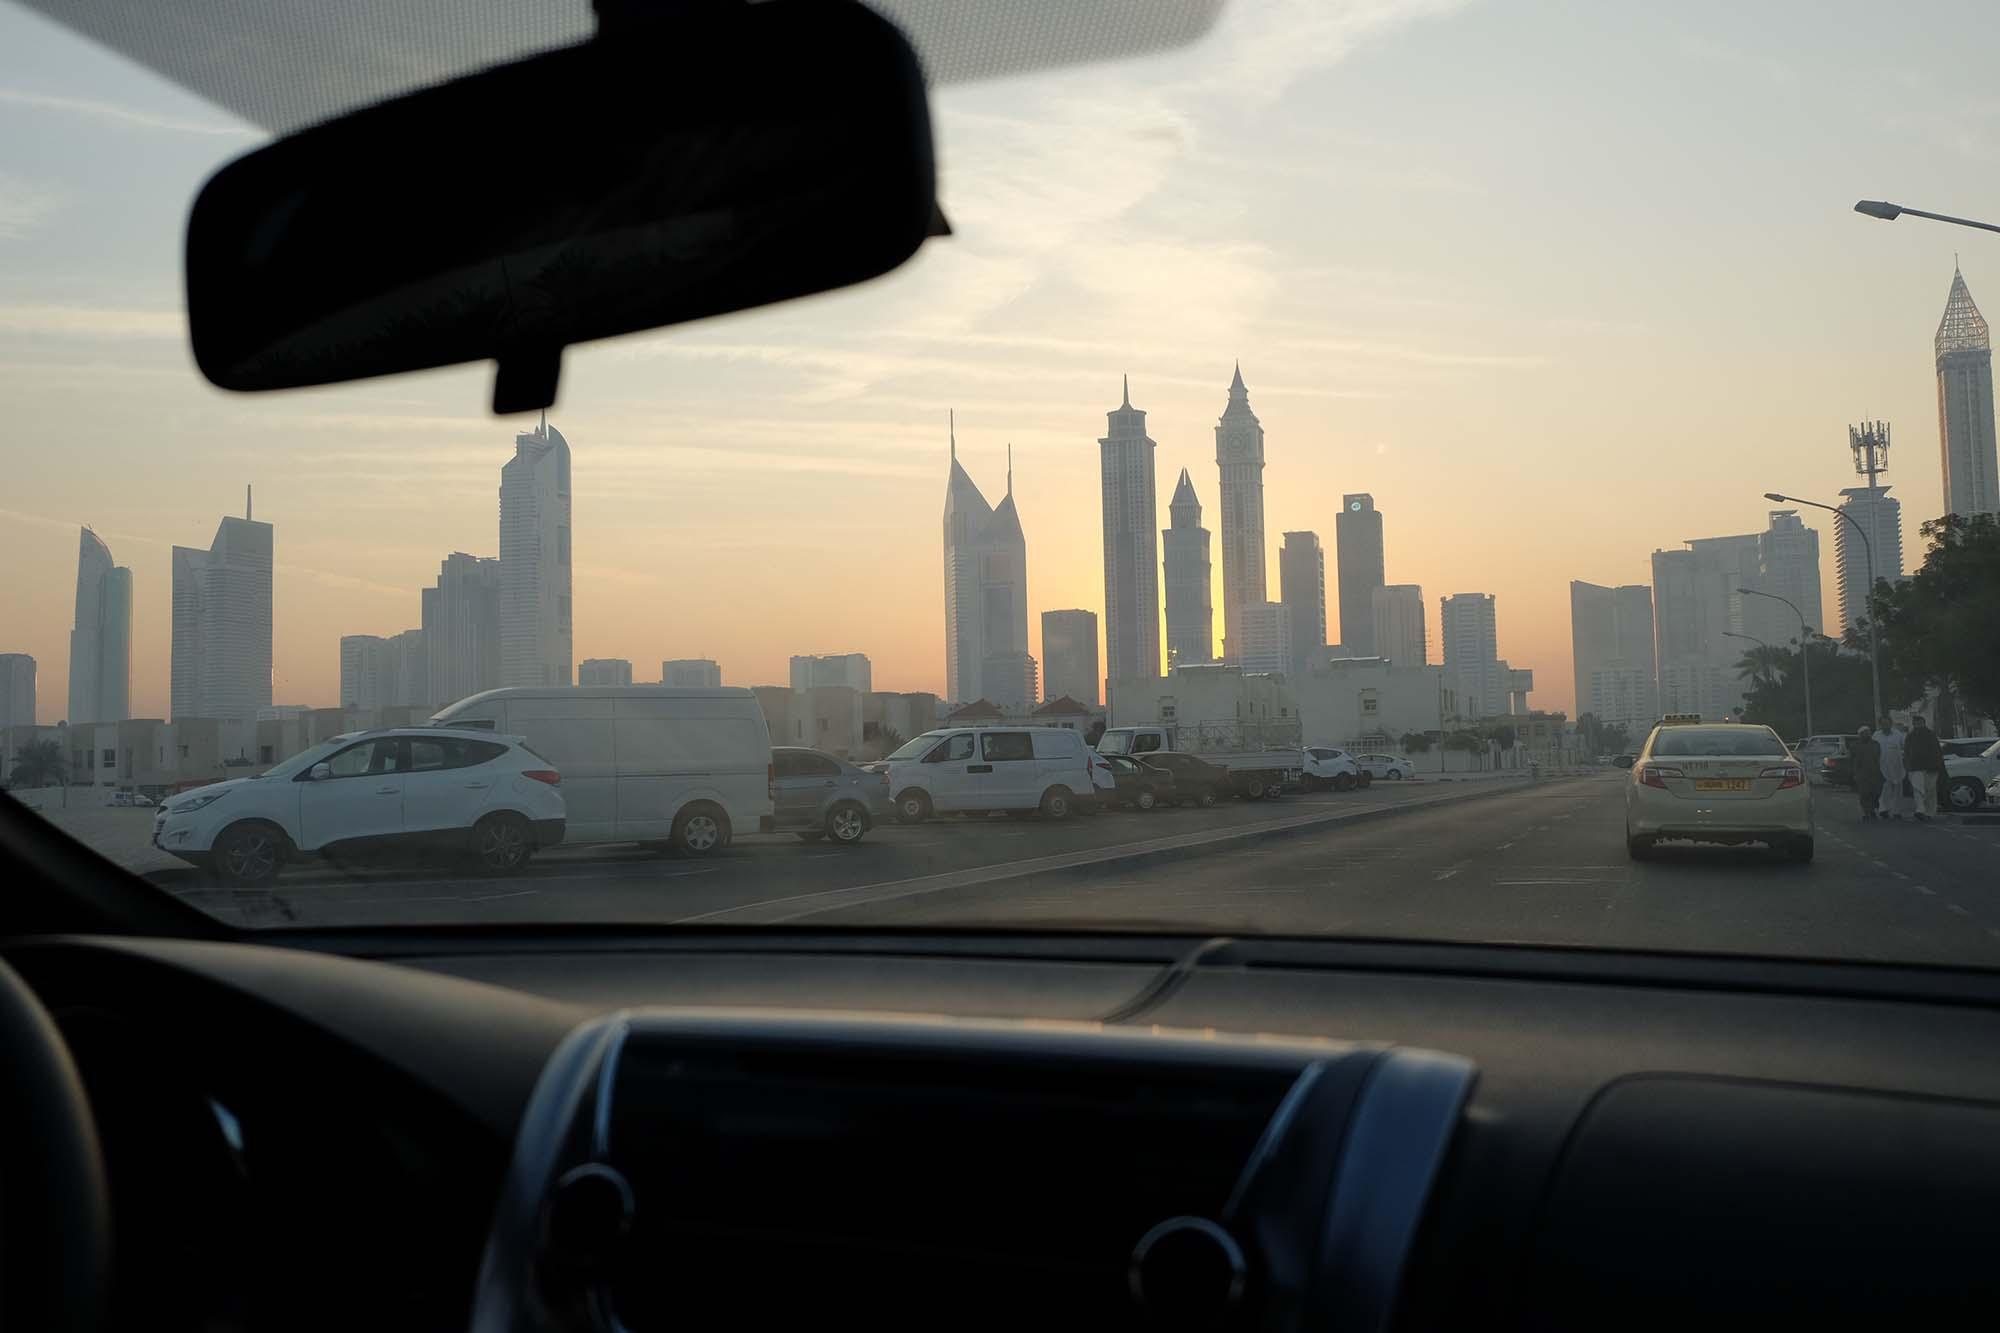 emirates guardians of time manfred kili kielnhofer car antique art sculpture contemporary arts fine modern design statue art tour faceless love religion freedom 9114